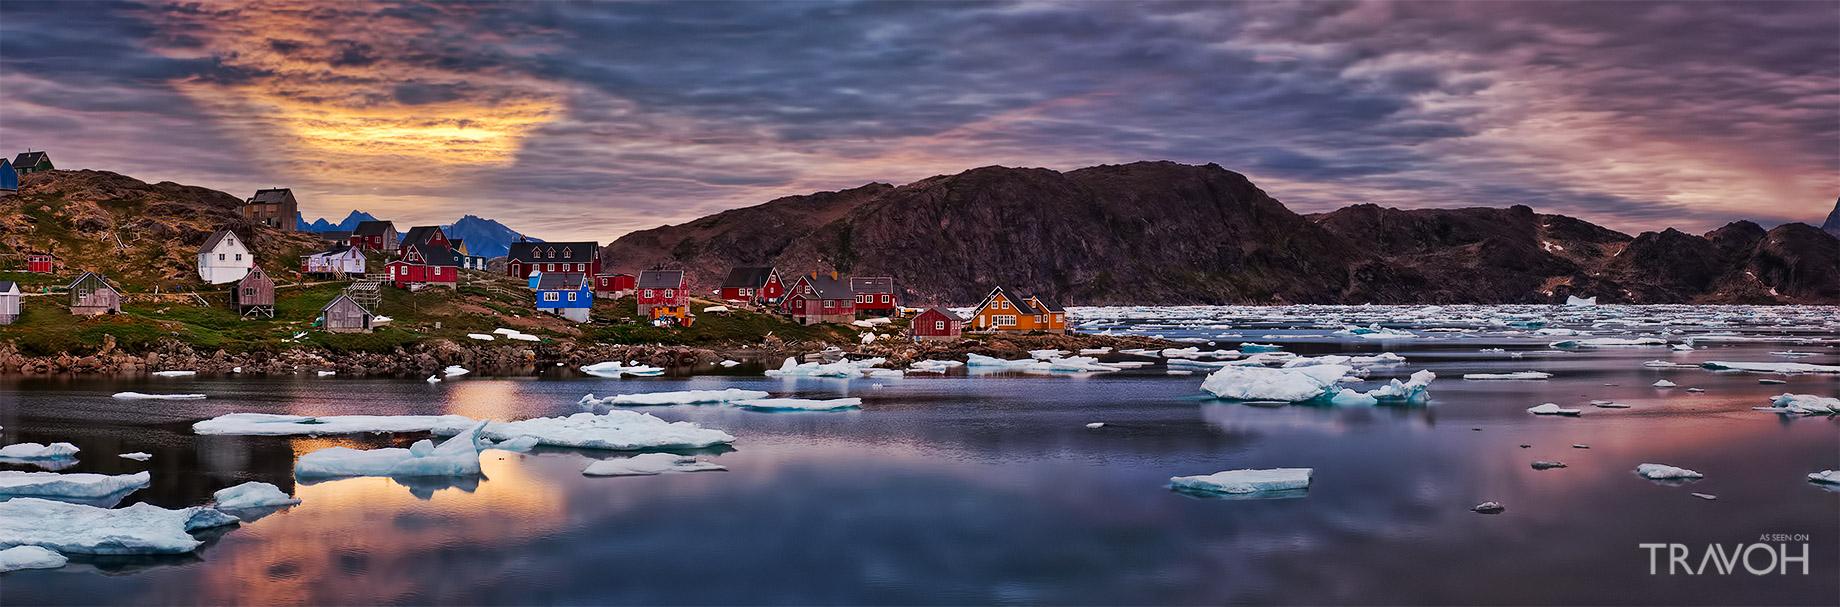 Arctic Sunset - Kulusuk, Sermersooq, Greenland